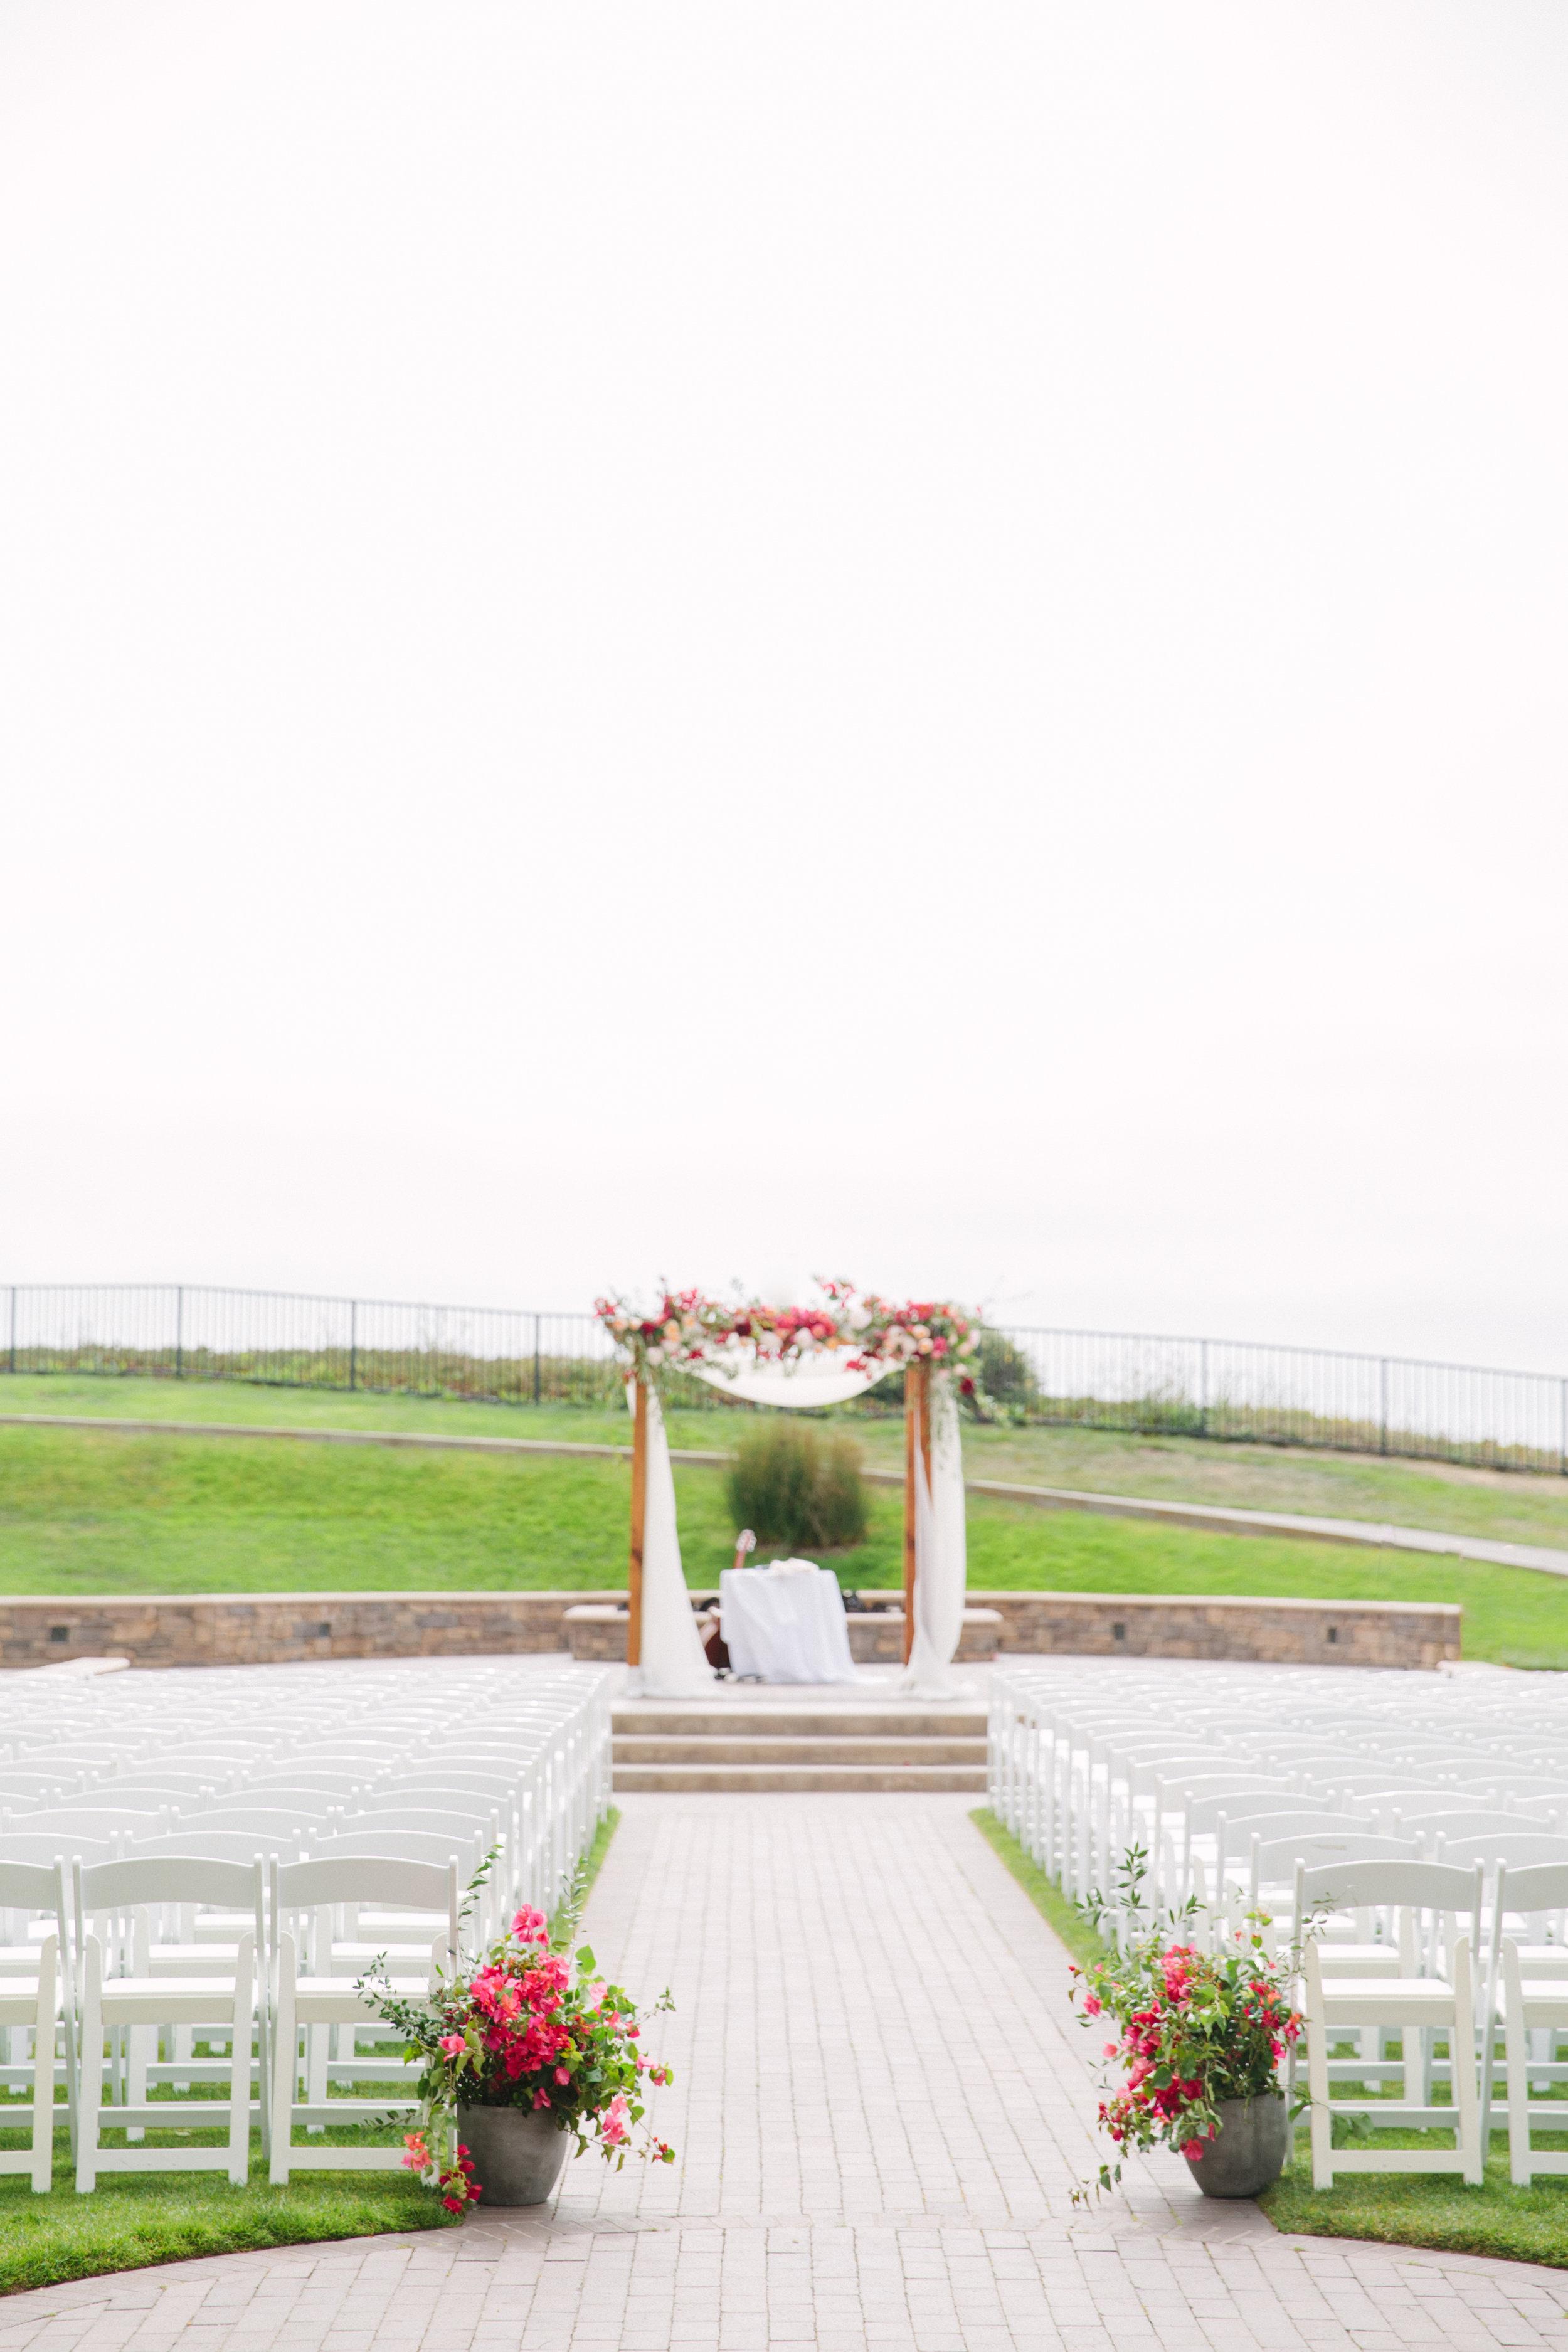 larissa-cleveland-sivanjeremy-wedding-0477-2.jpg